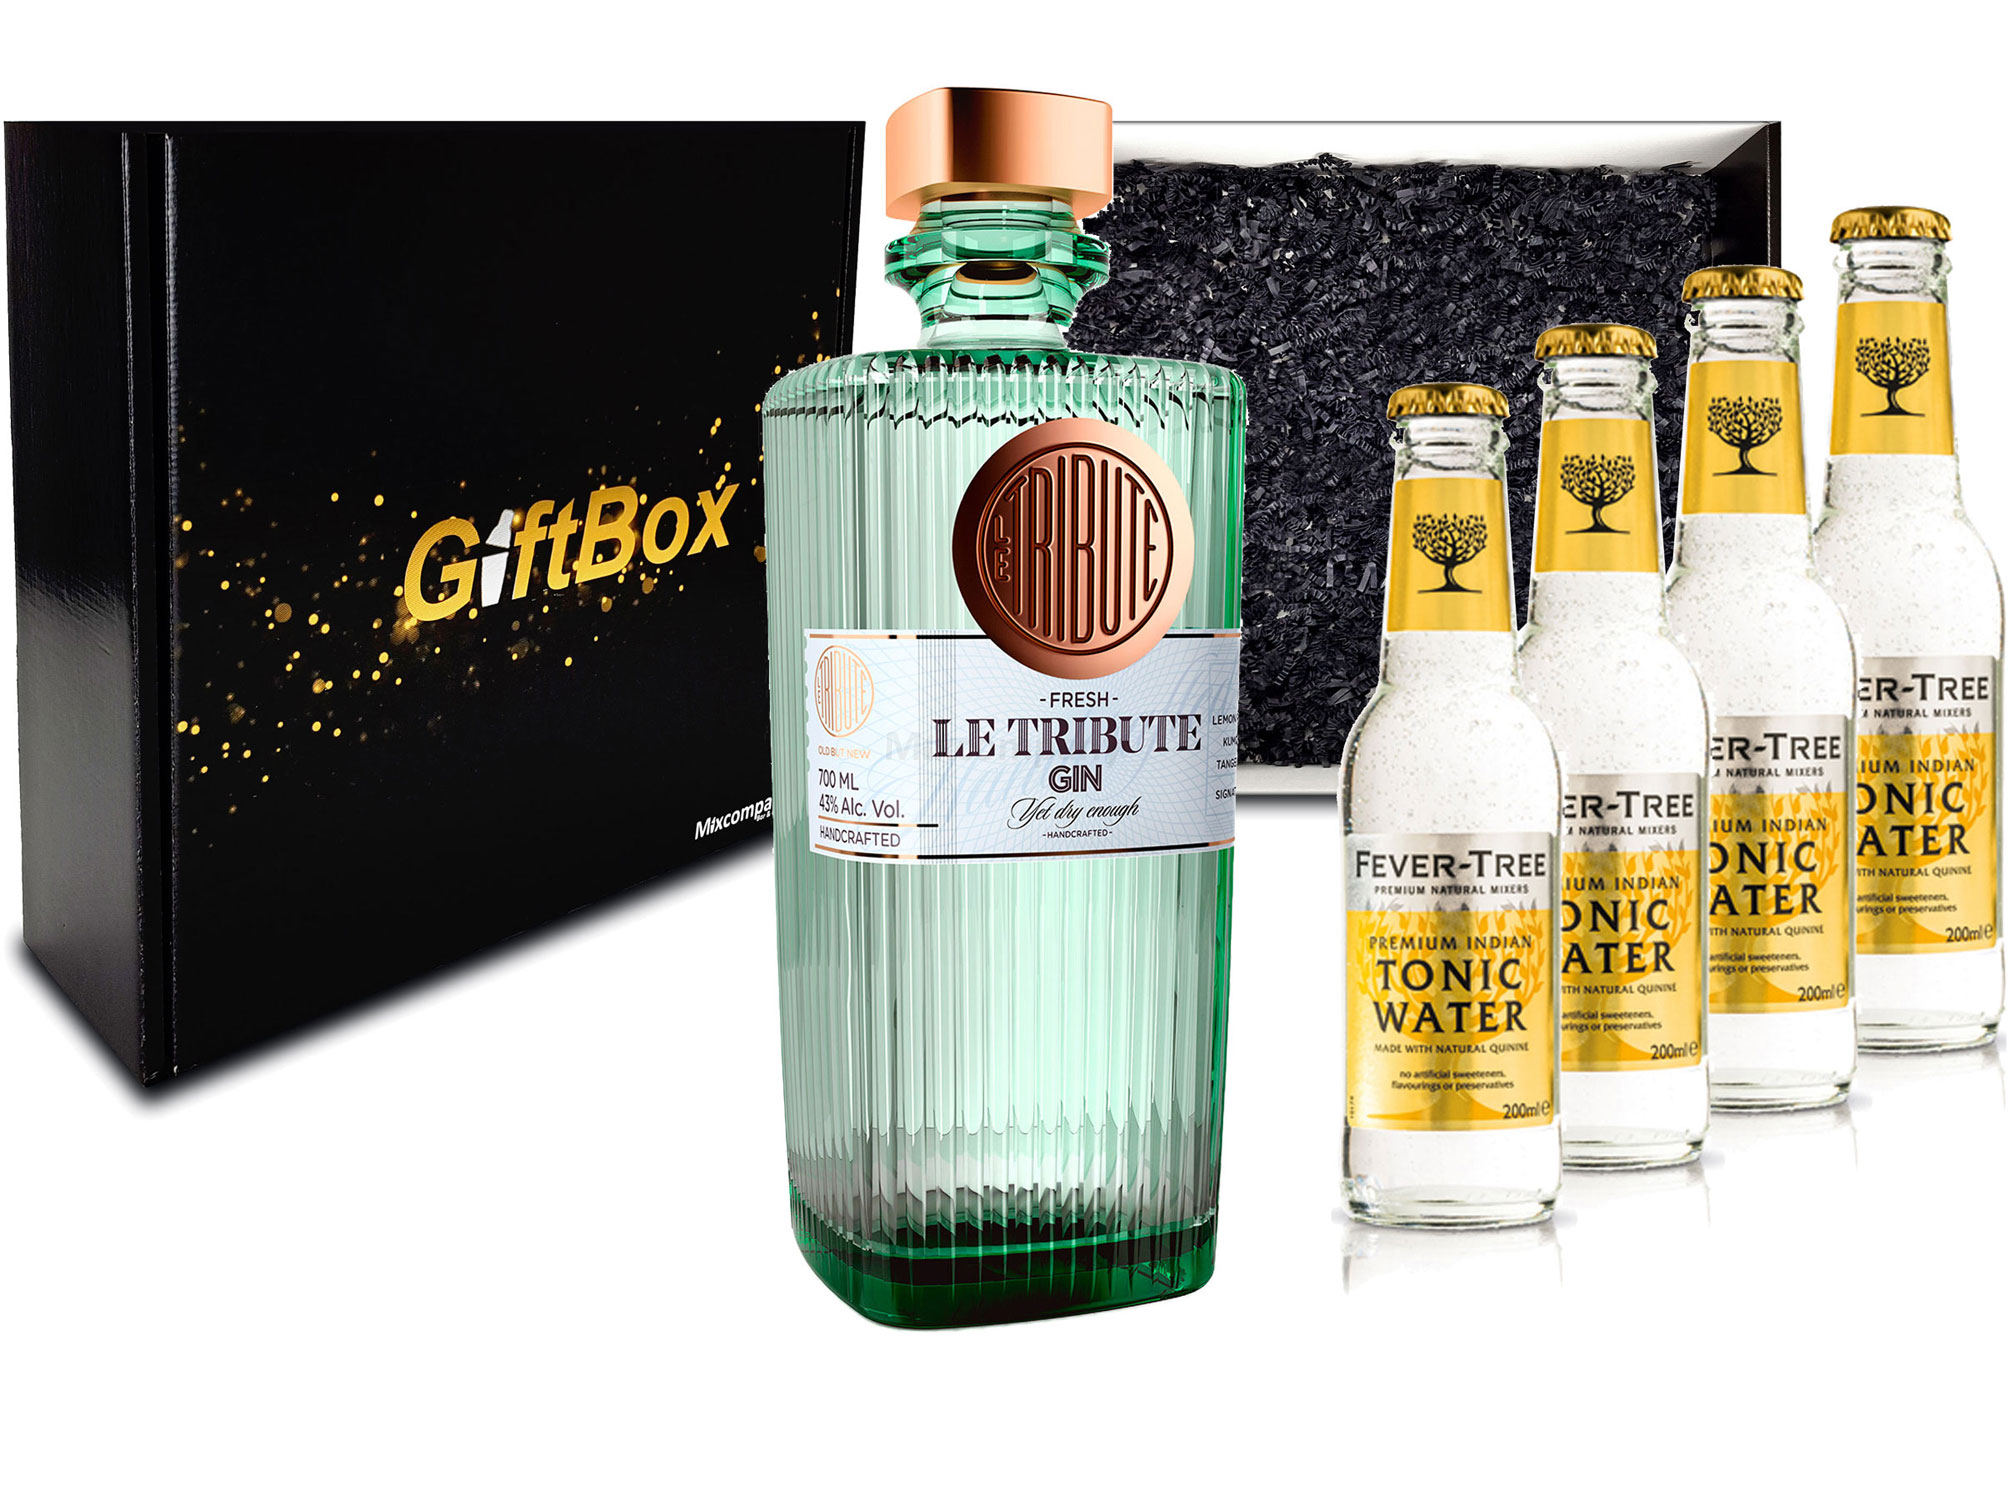 Gin Tonic Giftbox Geschenkset - Le Tribute Gin 0,7l (43% Vol) + 4x Fever Tree Tonic Water 200ml inkl. Pfand MEHRWEG - [Enthält Sulfite]